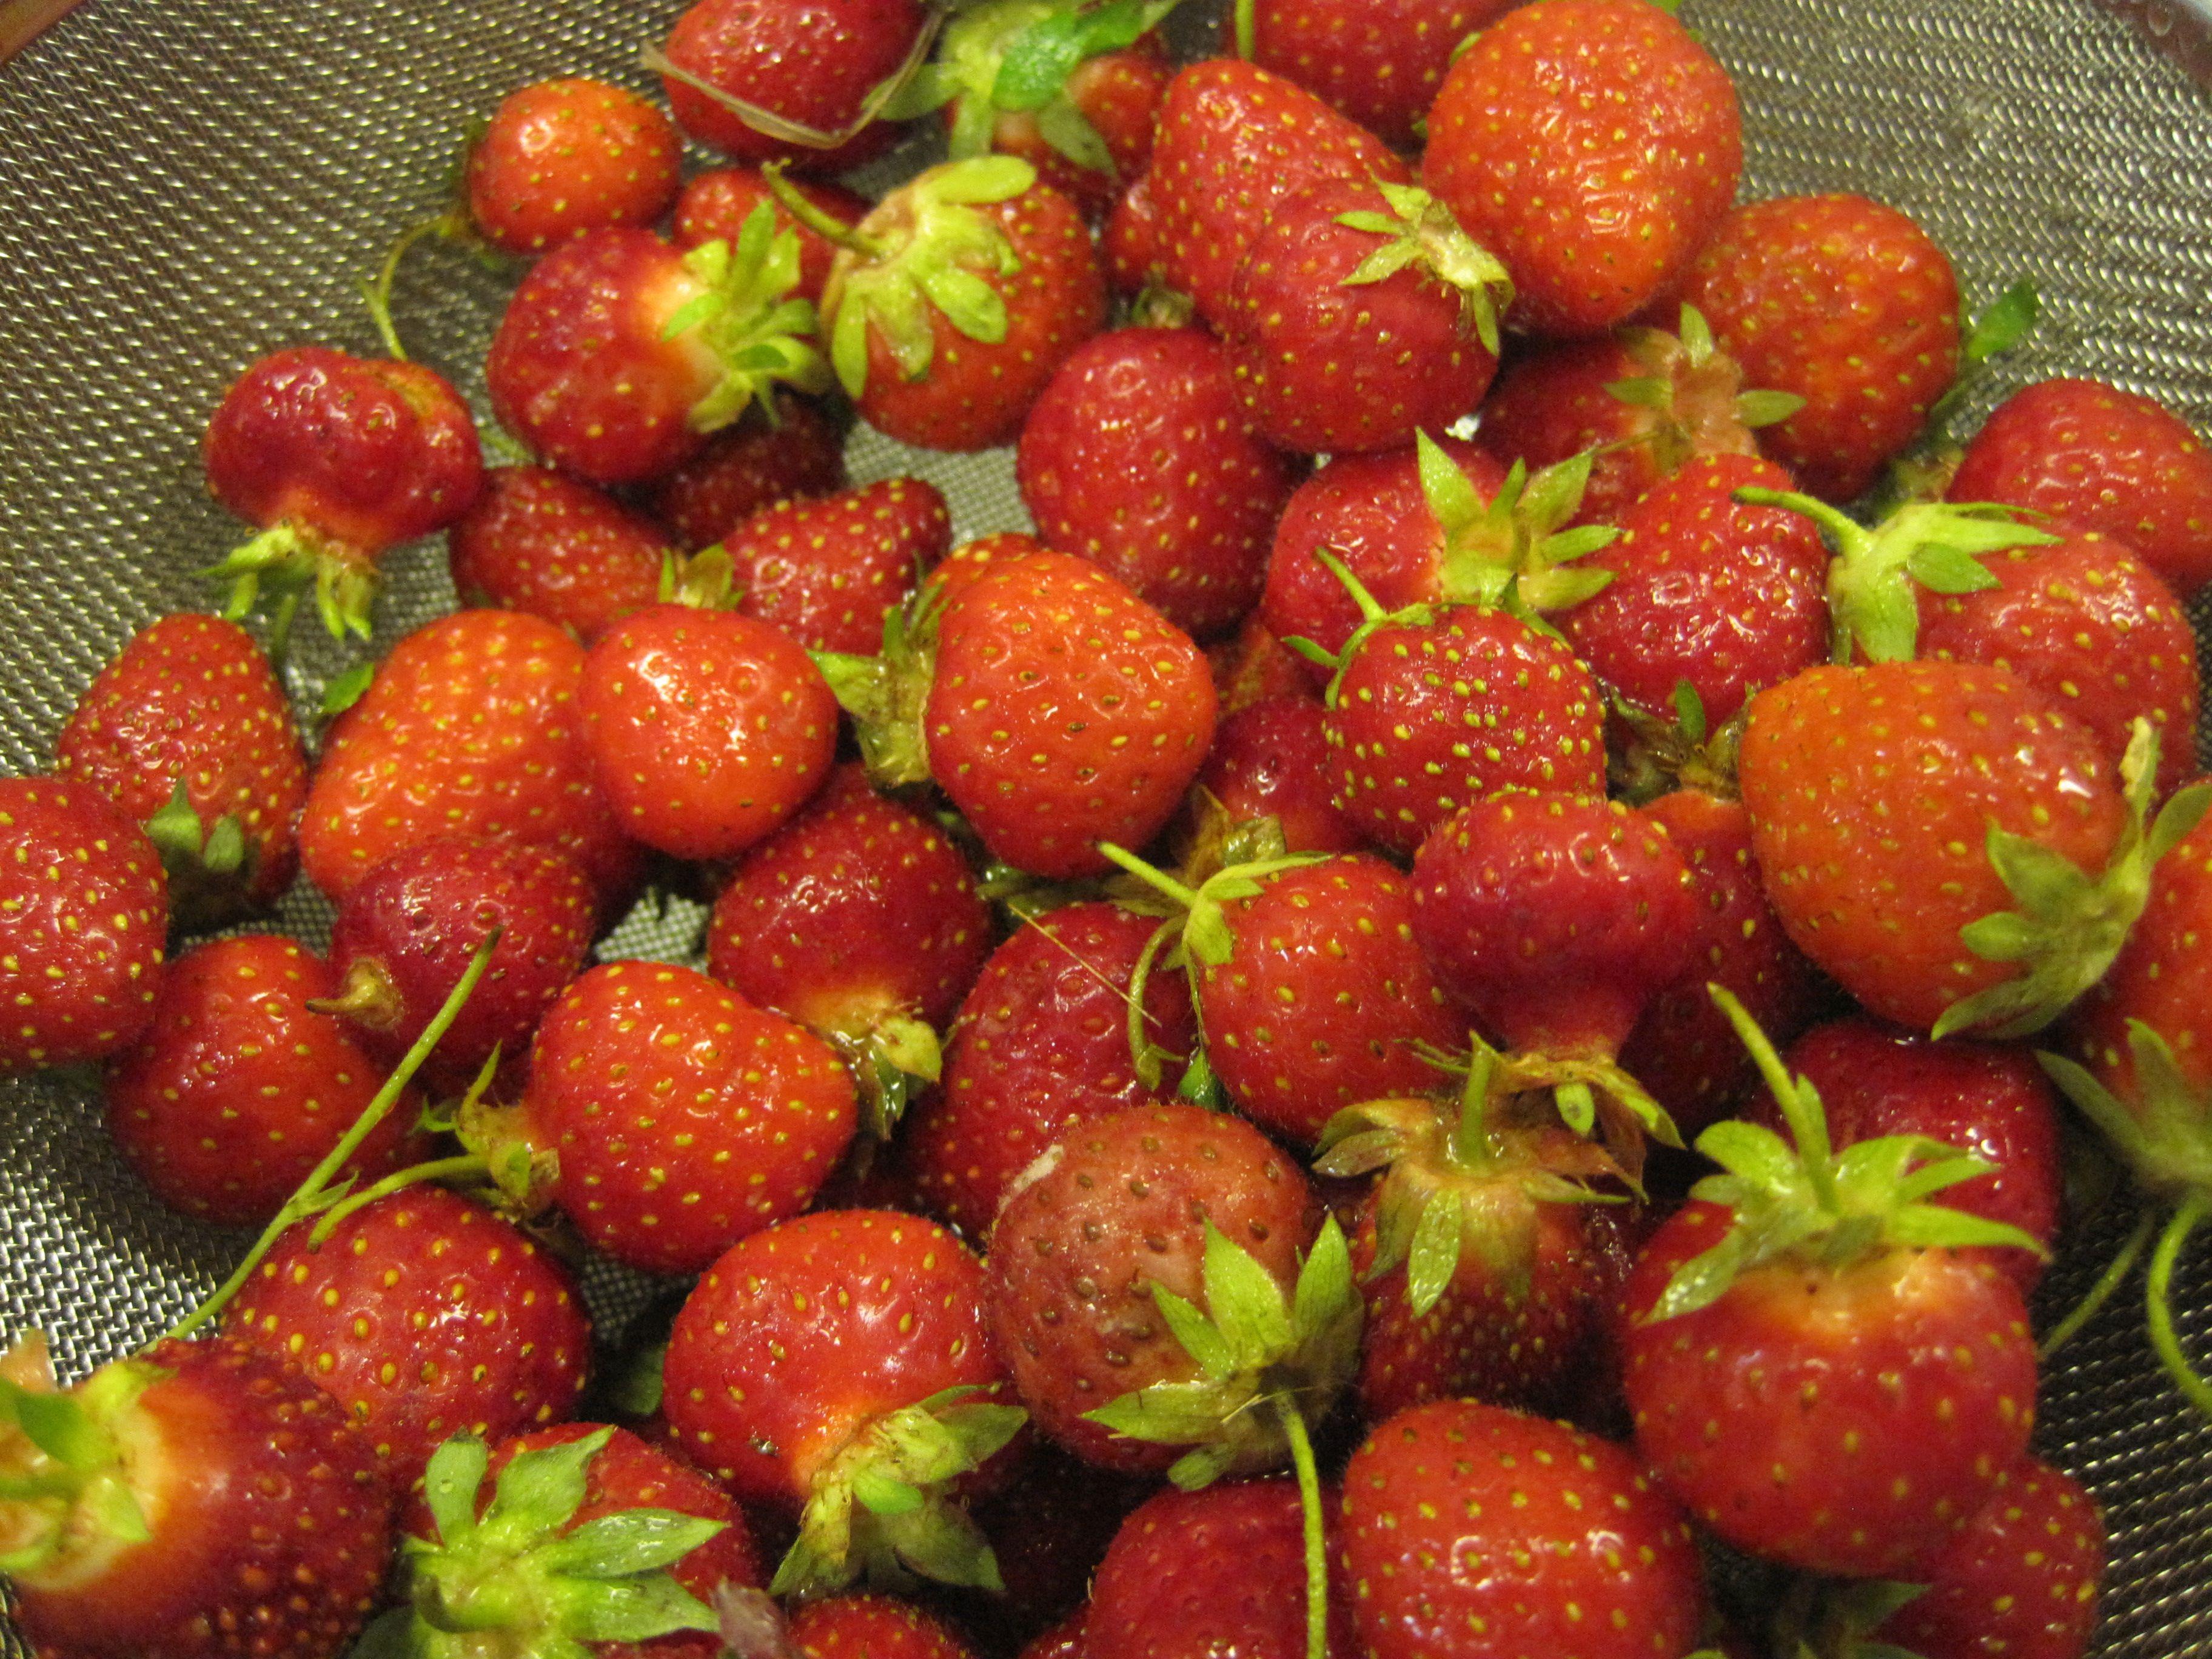 Lemon Verbena Scented Strawberry Peach Conserves